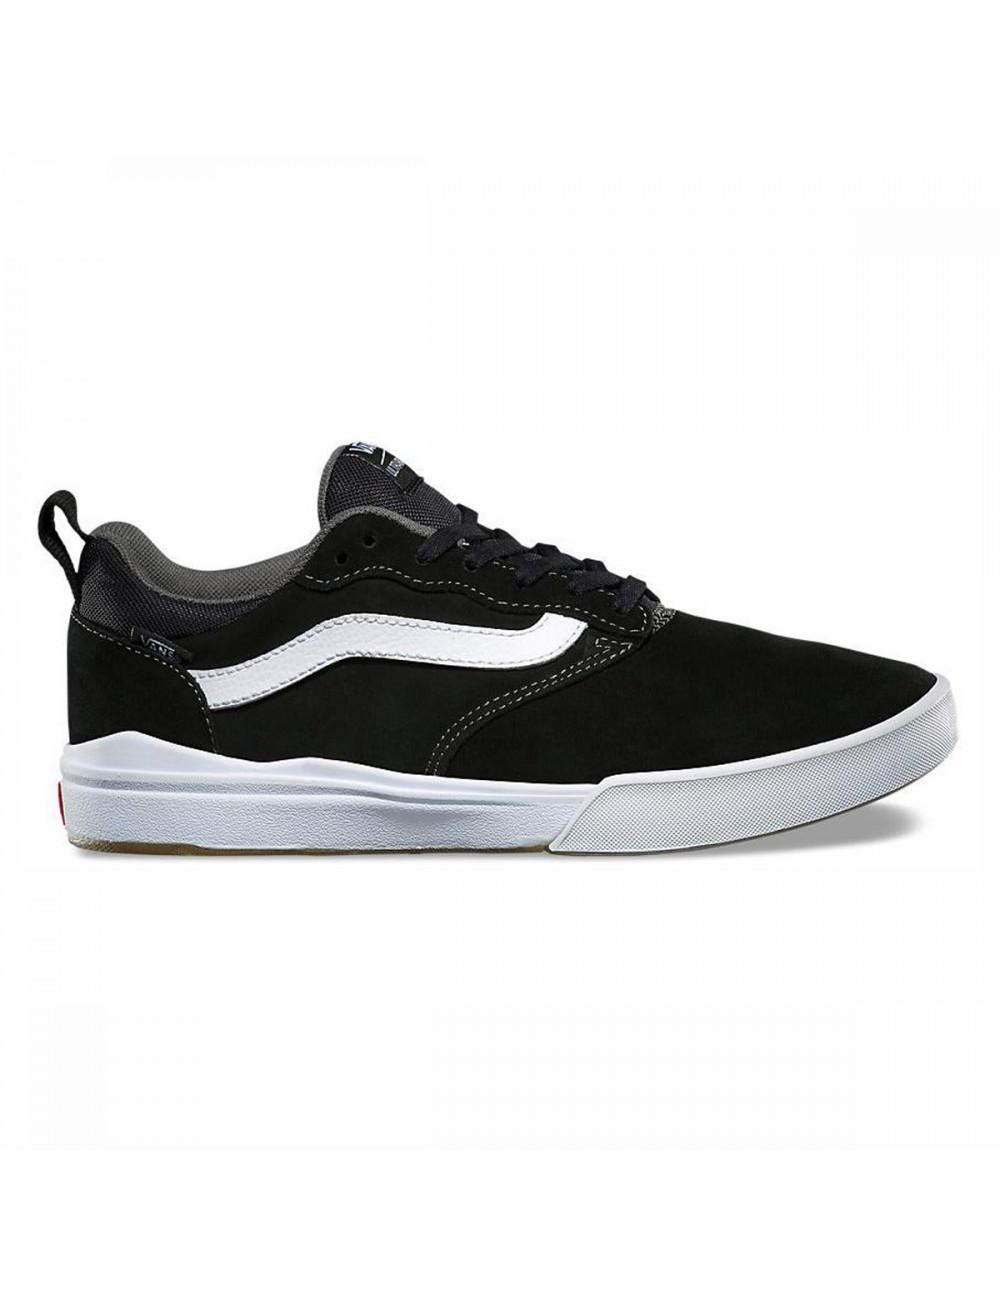 Vans Ultrarange Pro Shoes - Black/White_11478